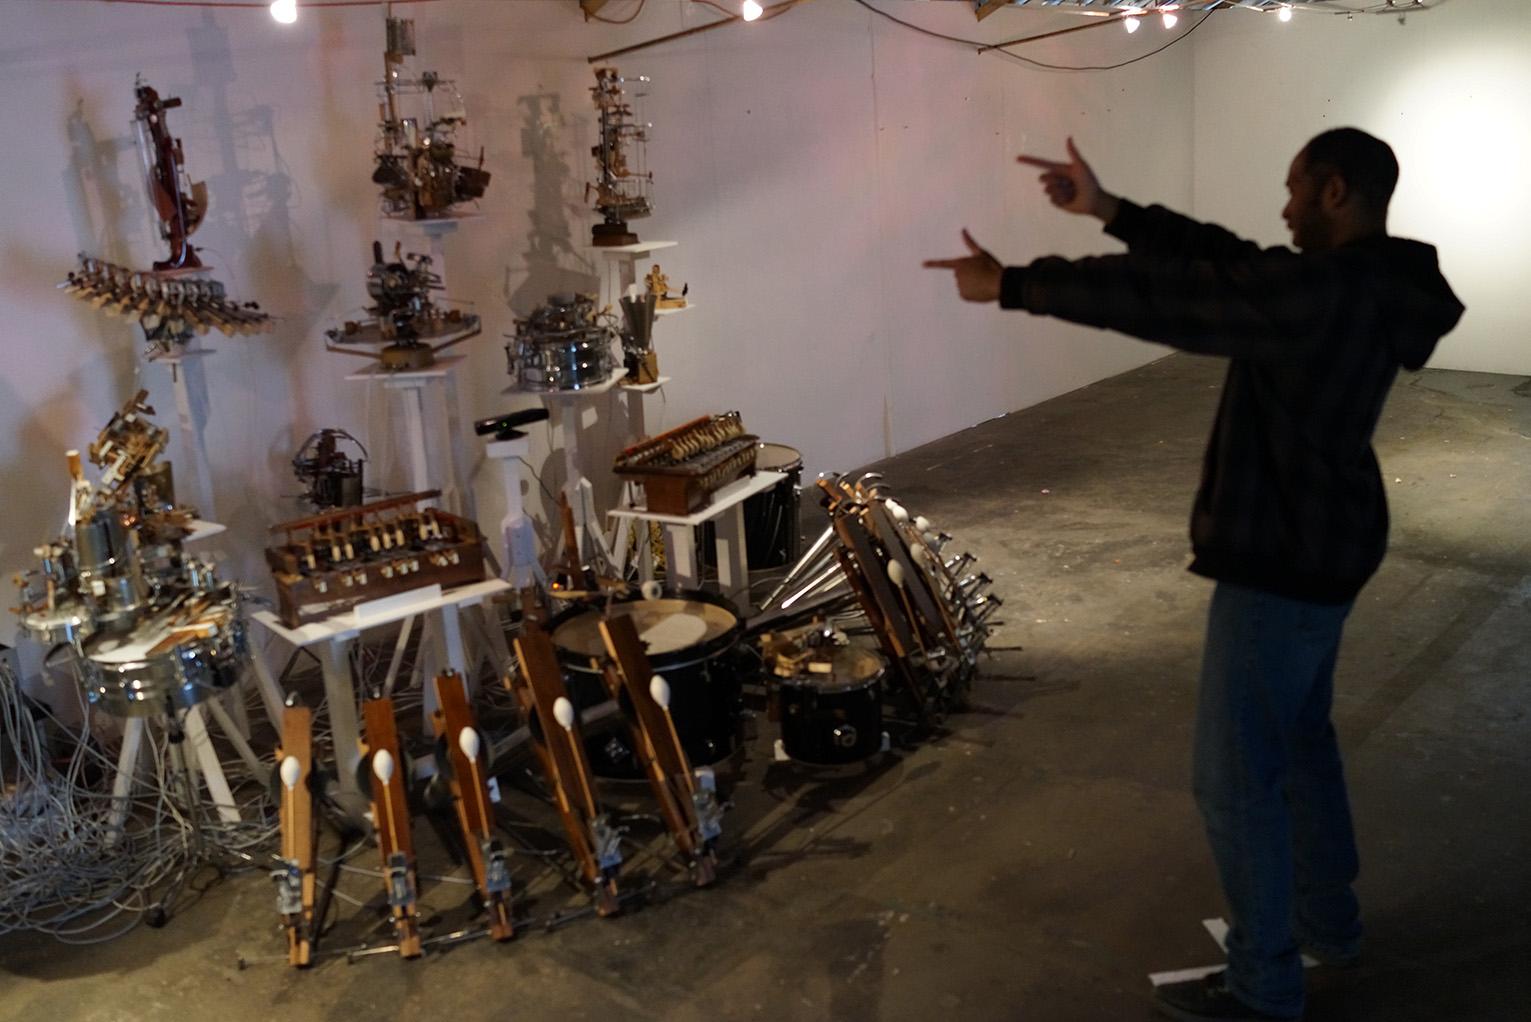 Felixs-Machines-and-Kinect (6).jpg